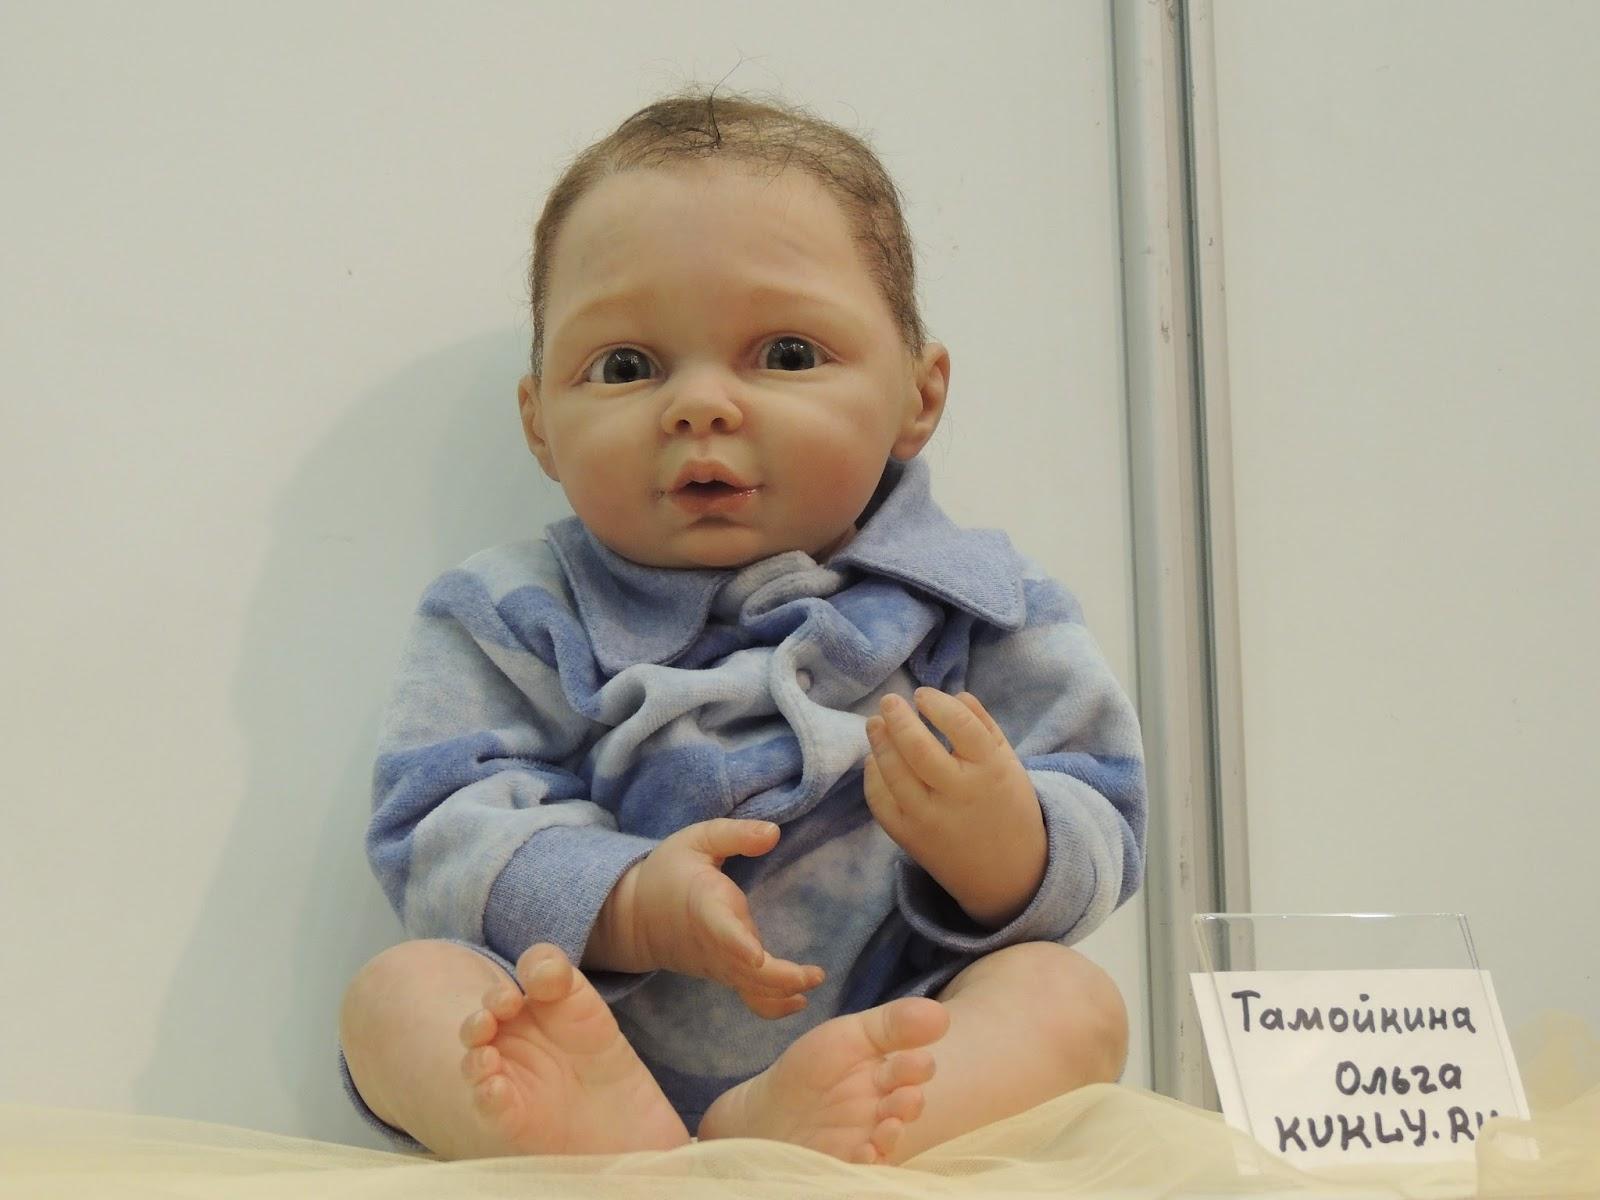 кукла,реборн,ребенок,выставка,тишинка